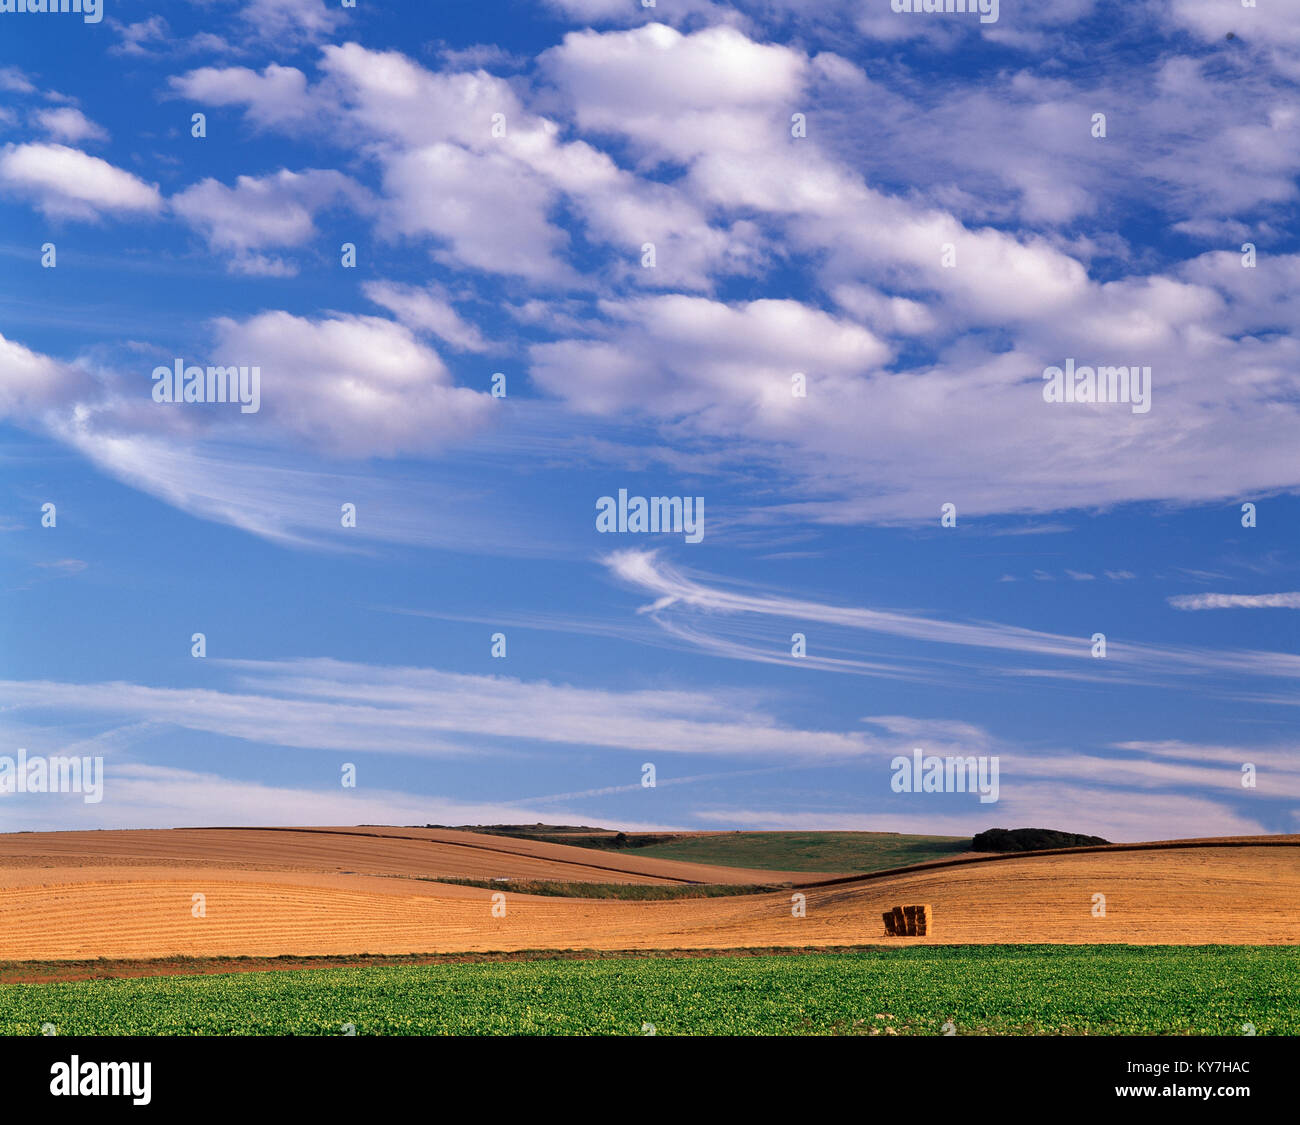 Agricultural landscape near Calais, Pas de Calais, France, - Stock Image